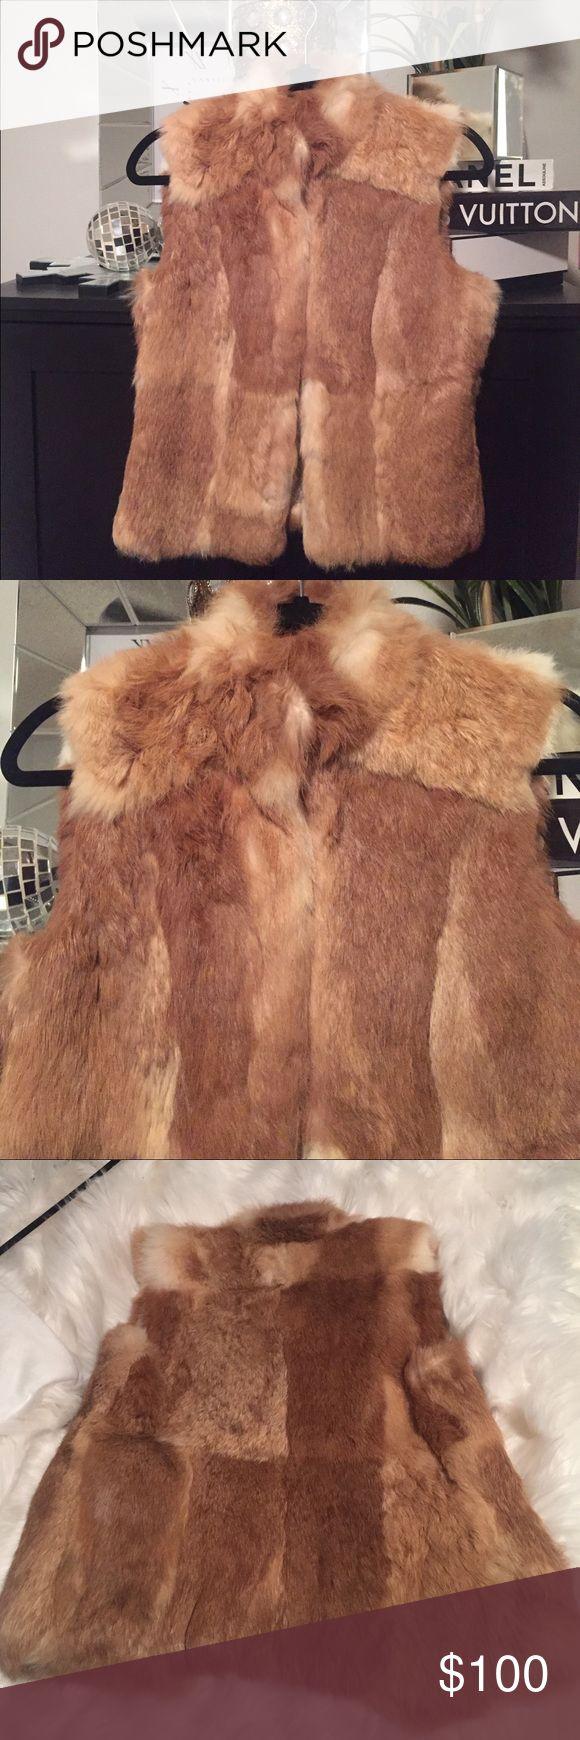 Elie Tahari Woman's rabbit fur vest size small Elie Tahari Woman's 100 % rabbit fur vest size small from Bergdorf Goodman like new only wore once Elie Tahari Jackets & Coats Vests